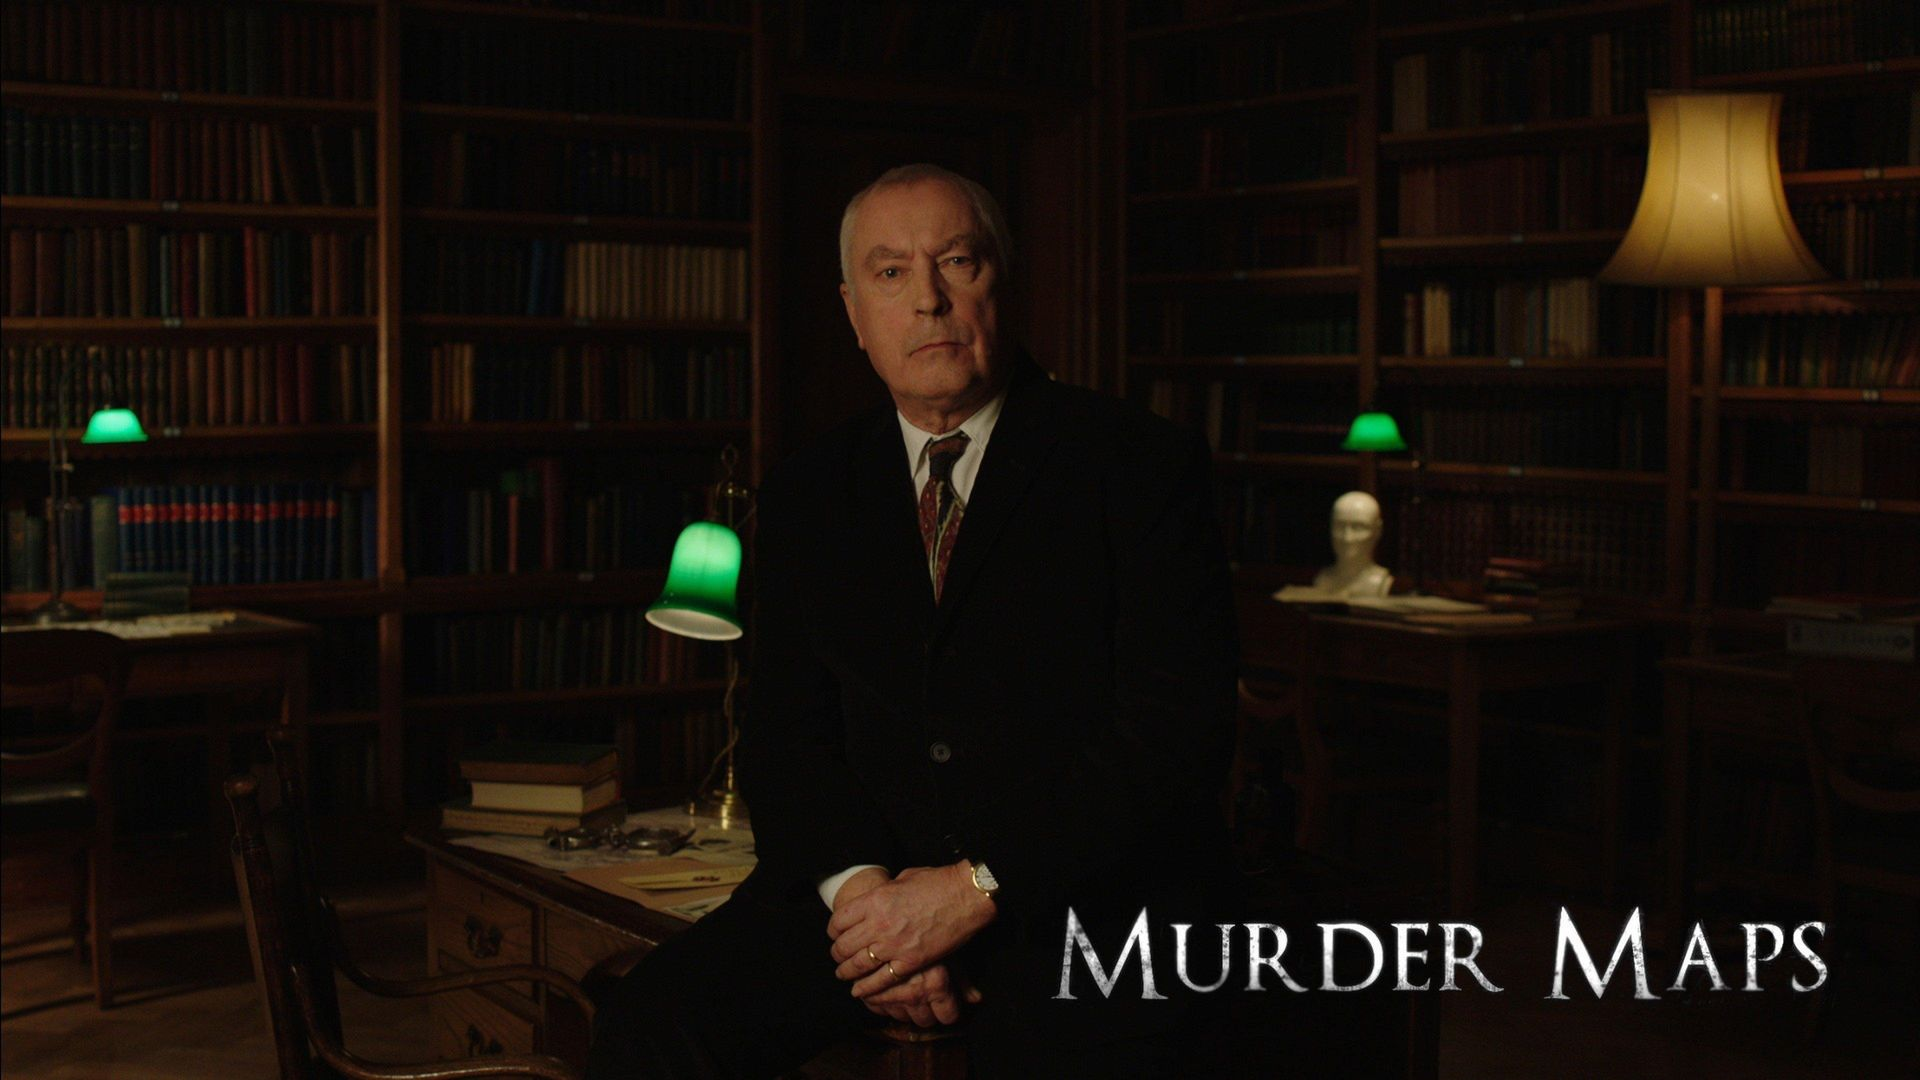 Murder Maps - Watch Episodes on Netflix or Streaming Online | Reelgood